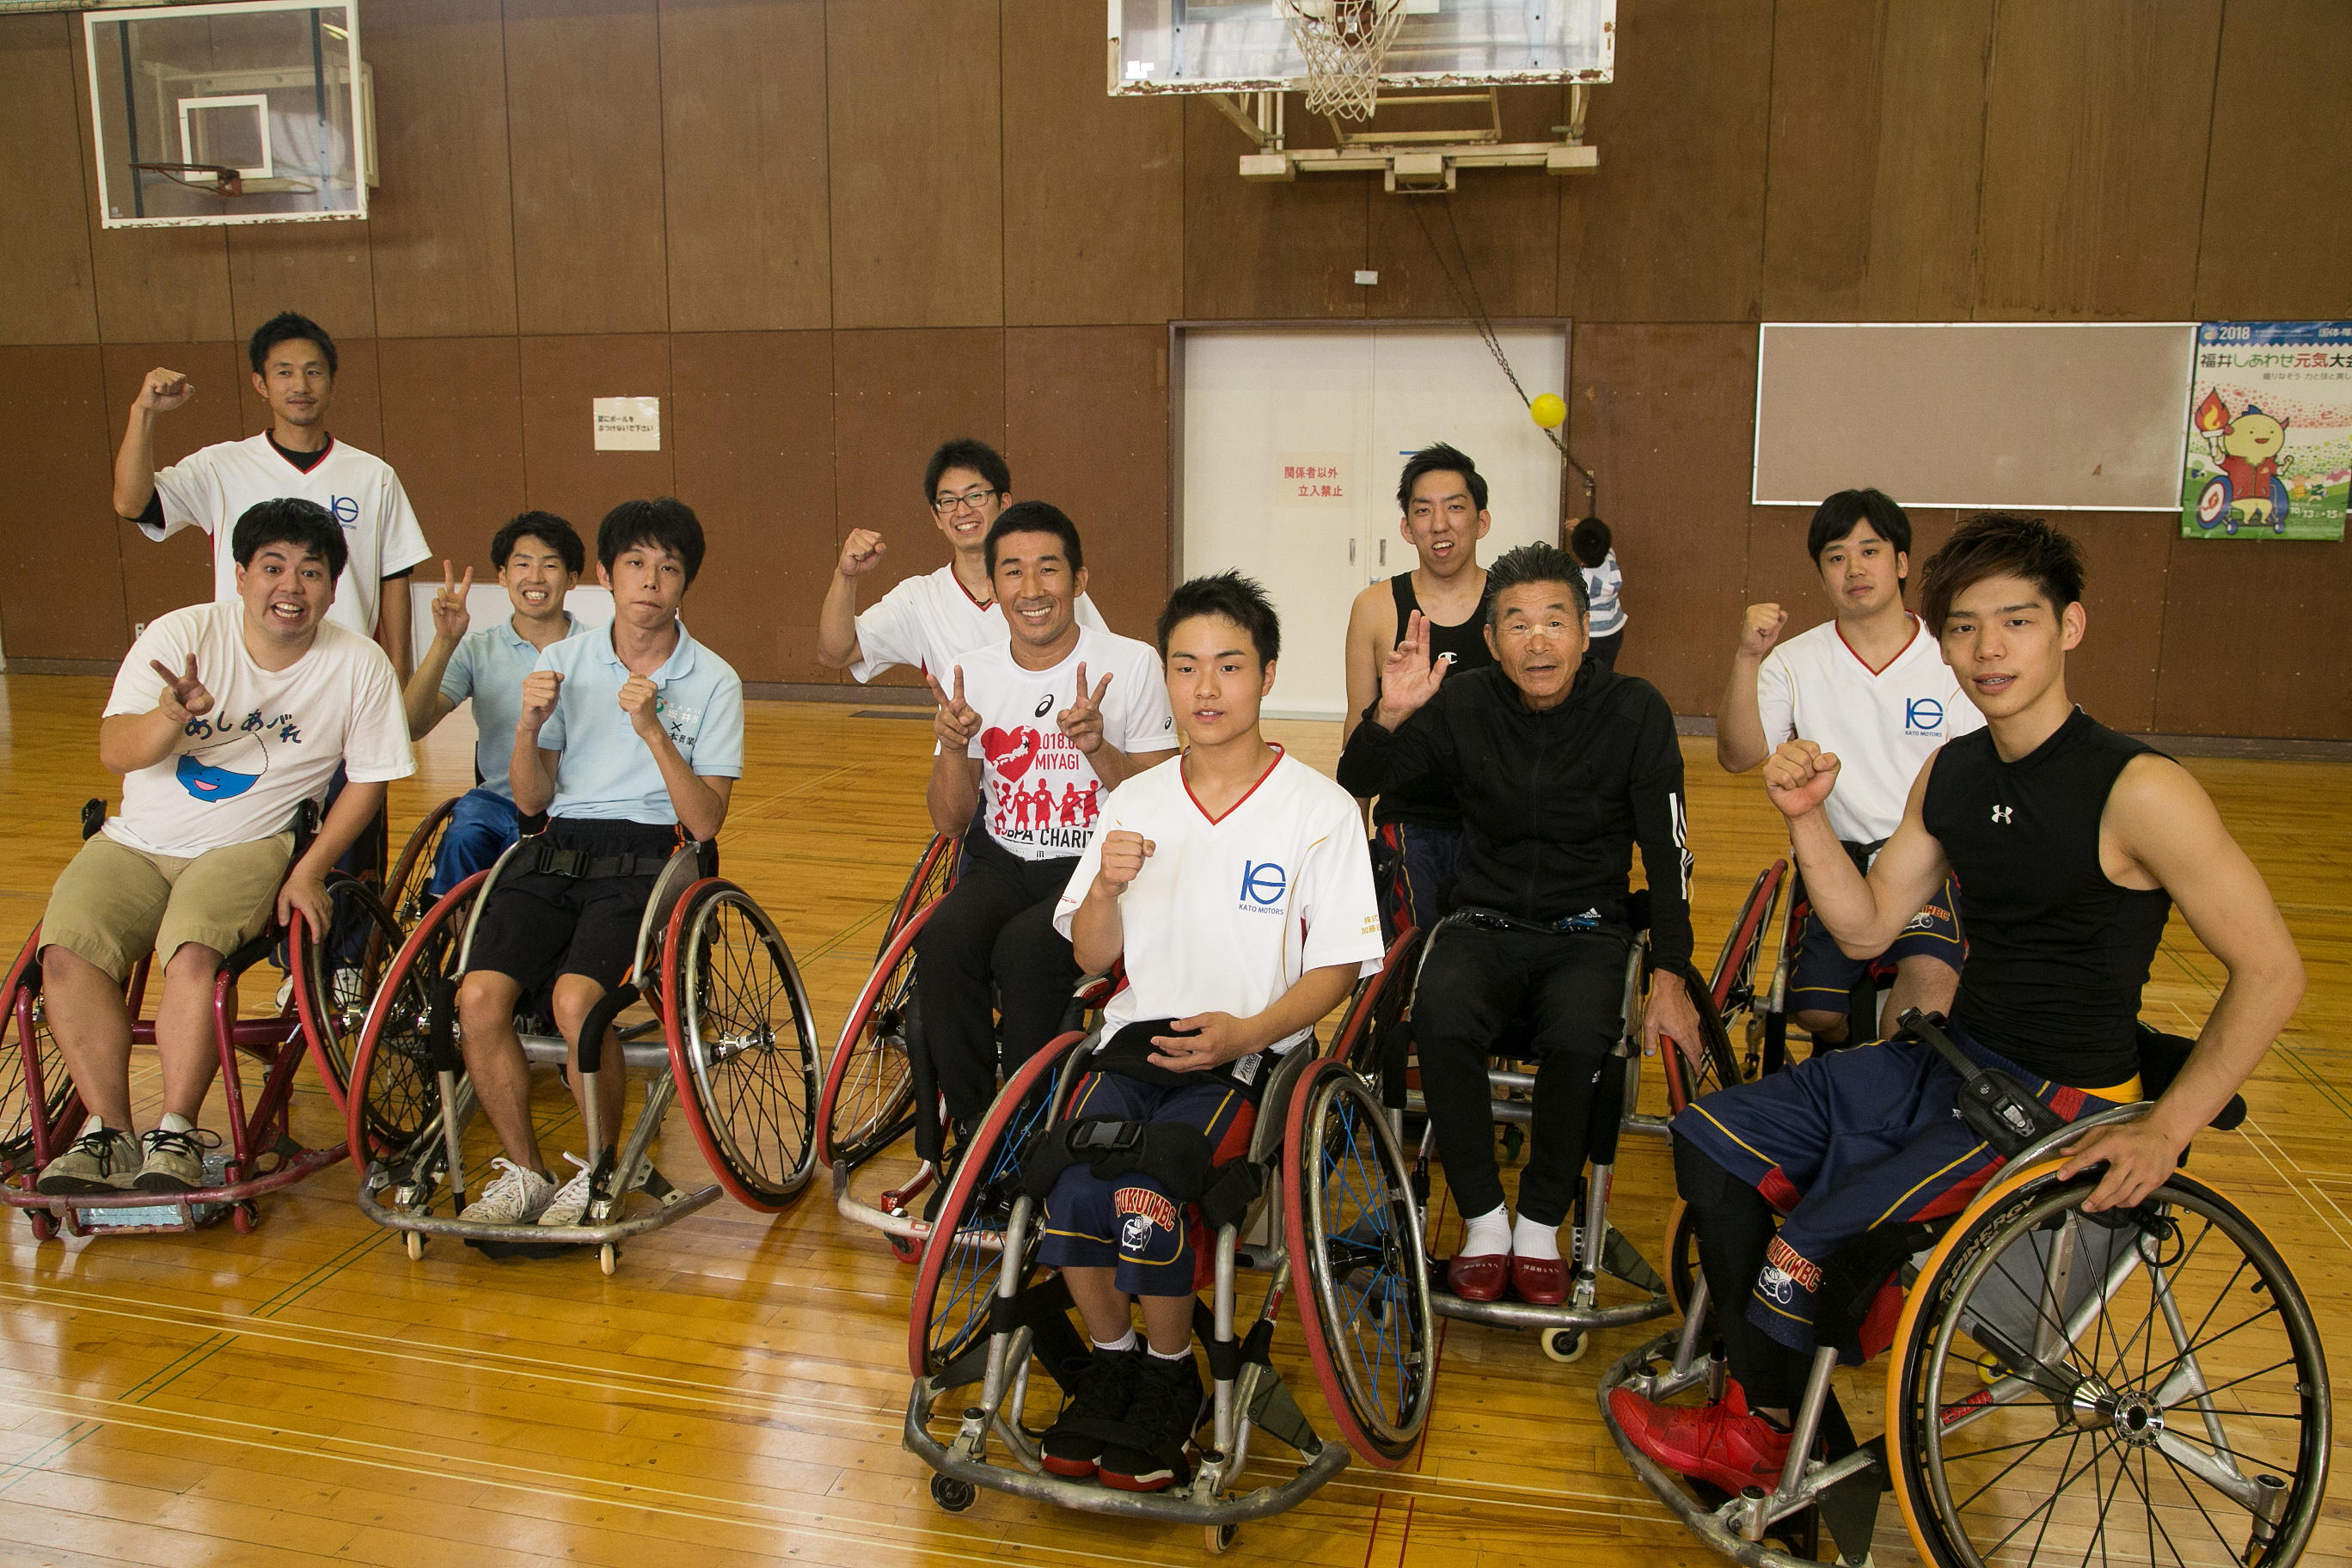 http://news.yoshimoto.co.jp/20181004222149-6e677ae218aac02d2ac26699c53851ef915dd37a.jpg